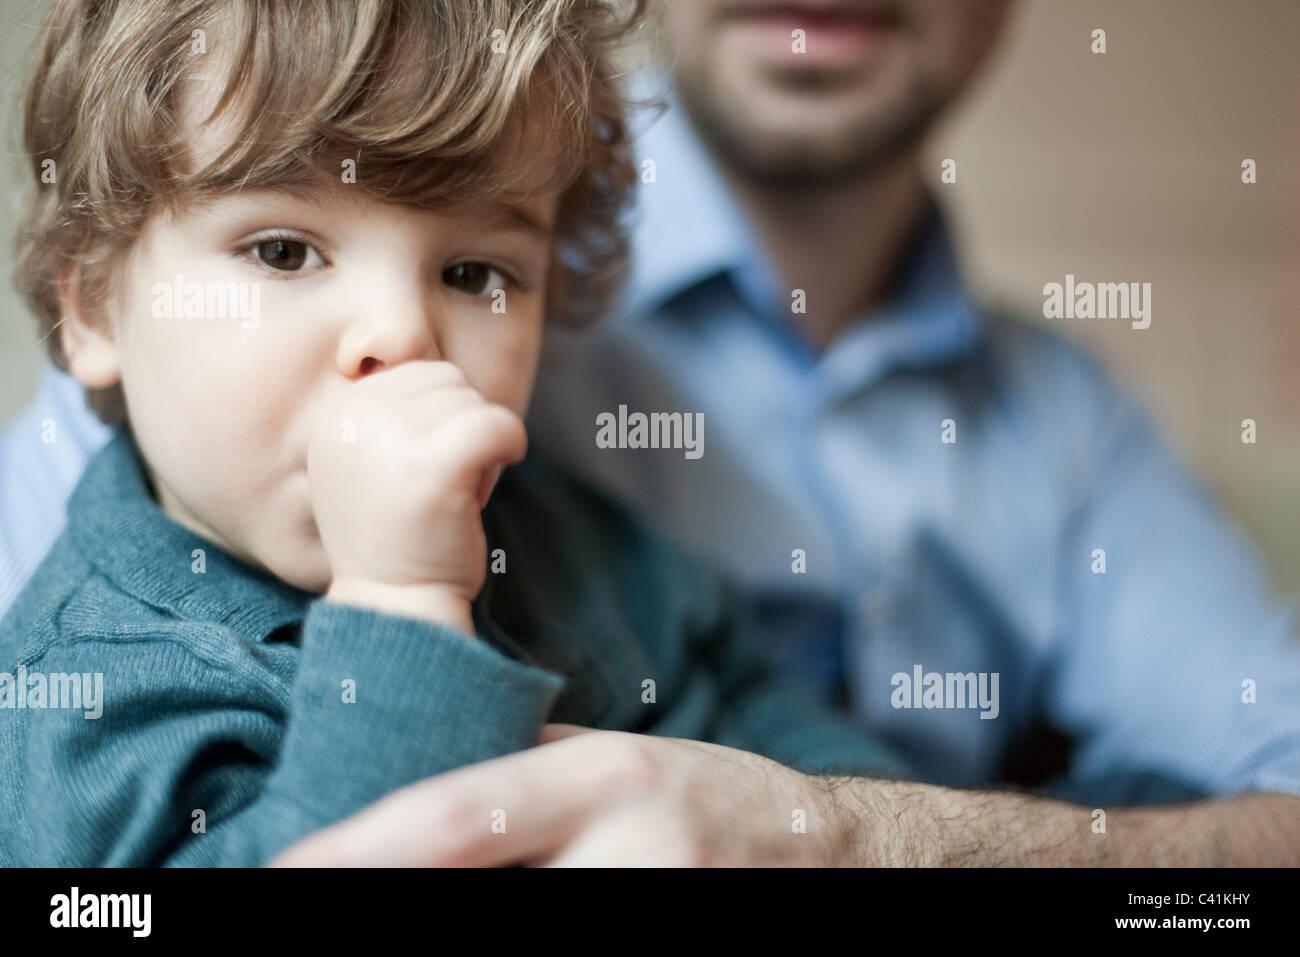 Toddler boy sucking thumb, portrait Stock Photo